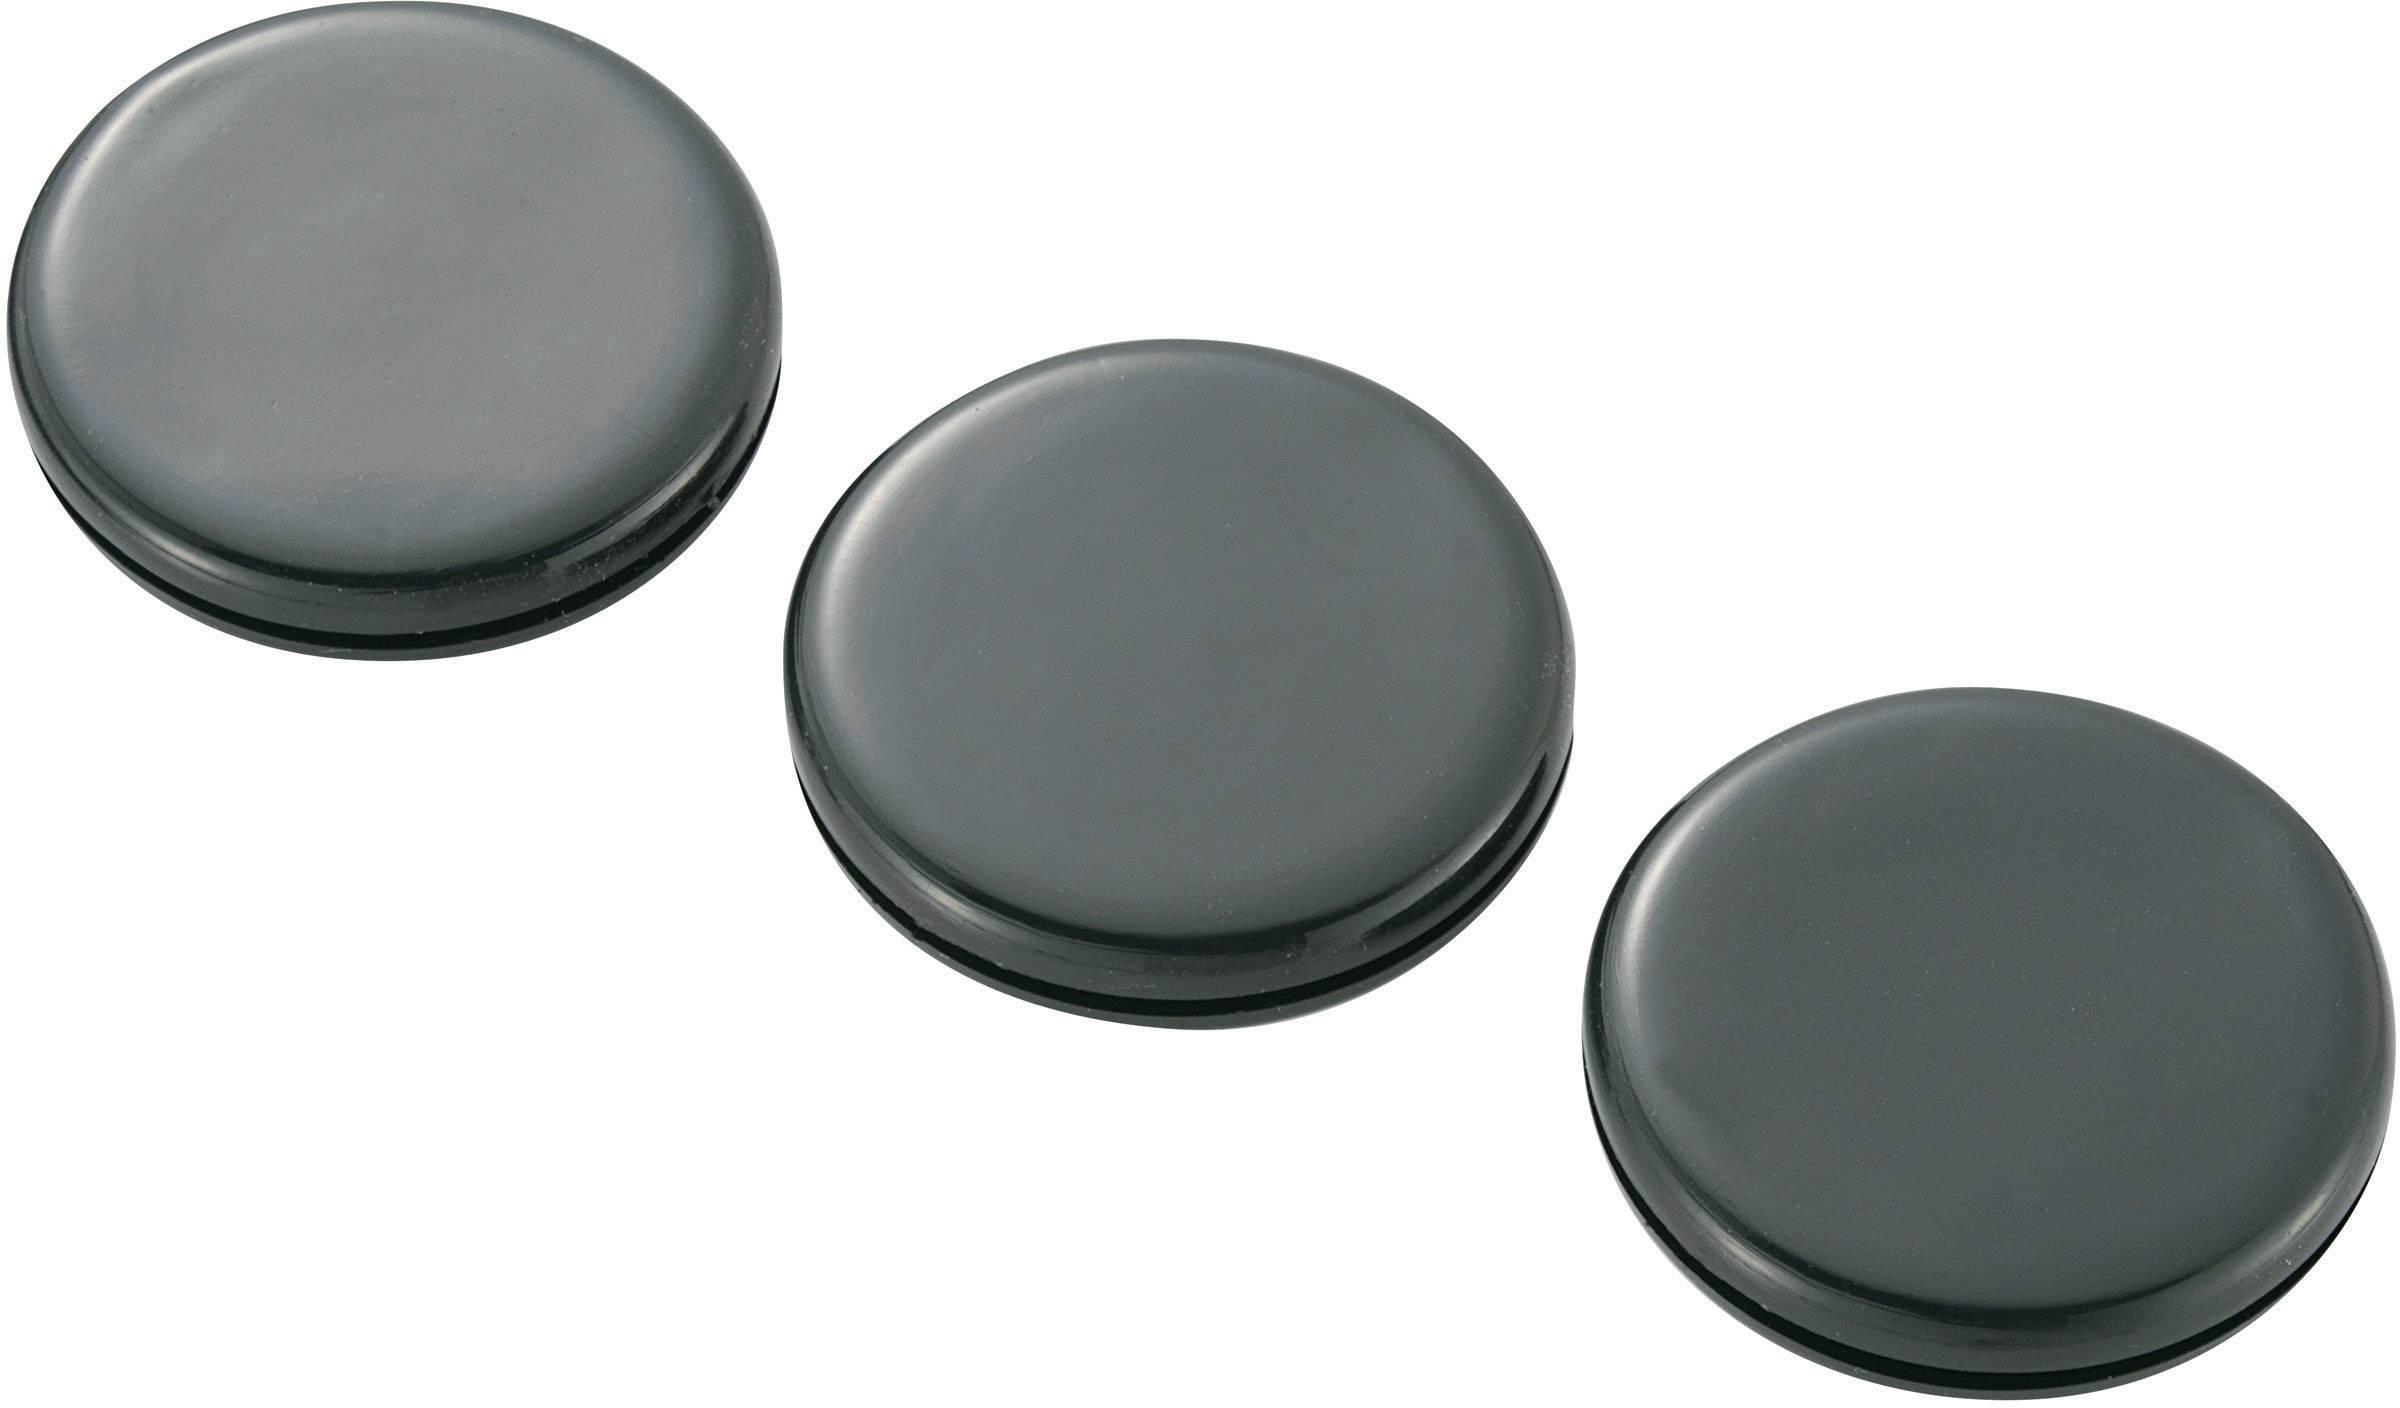 Káblová priechodka KSS GMCQR-3225, Ø 25 mm, PVC, čierna, 1 ks